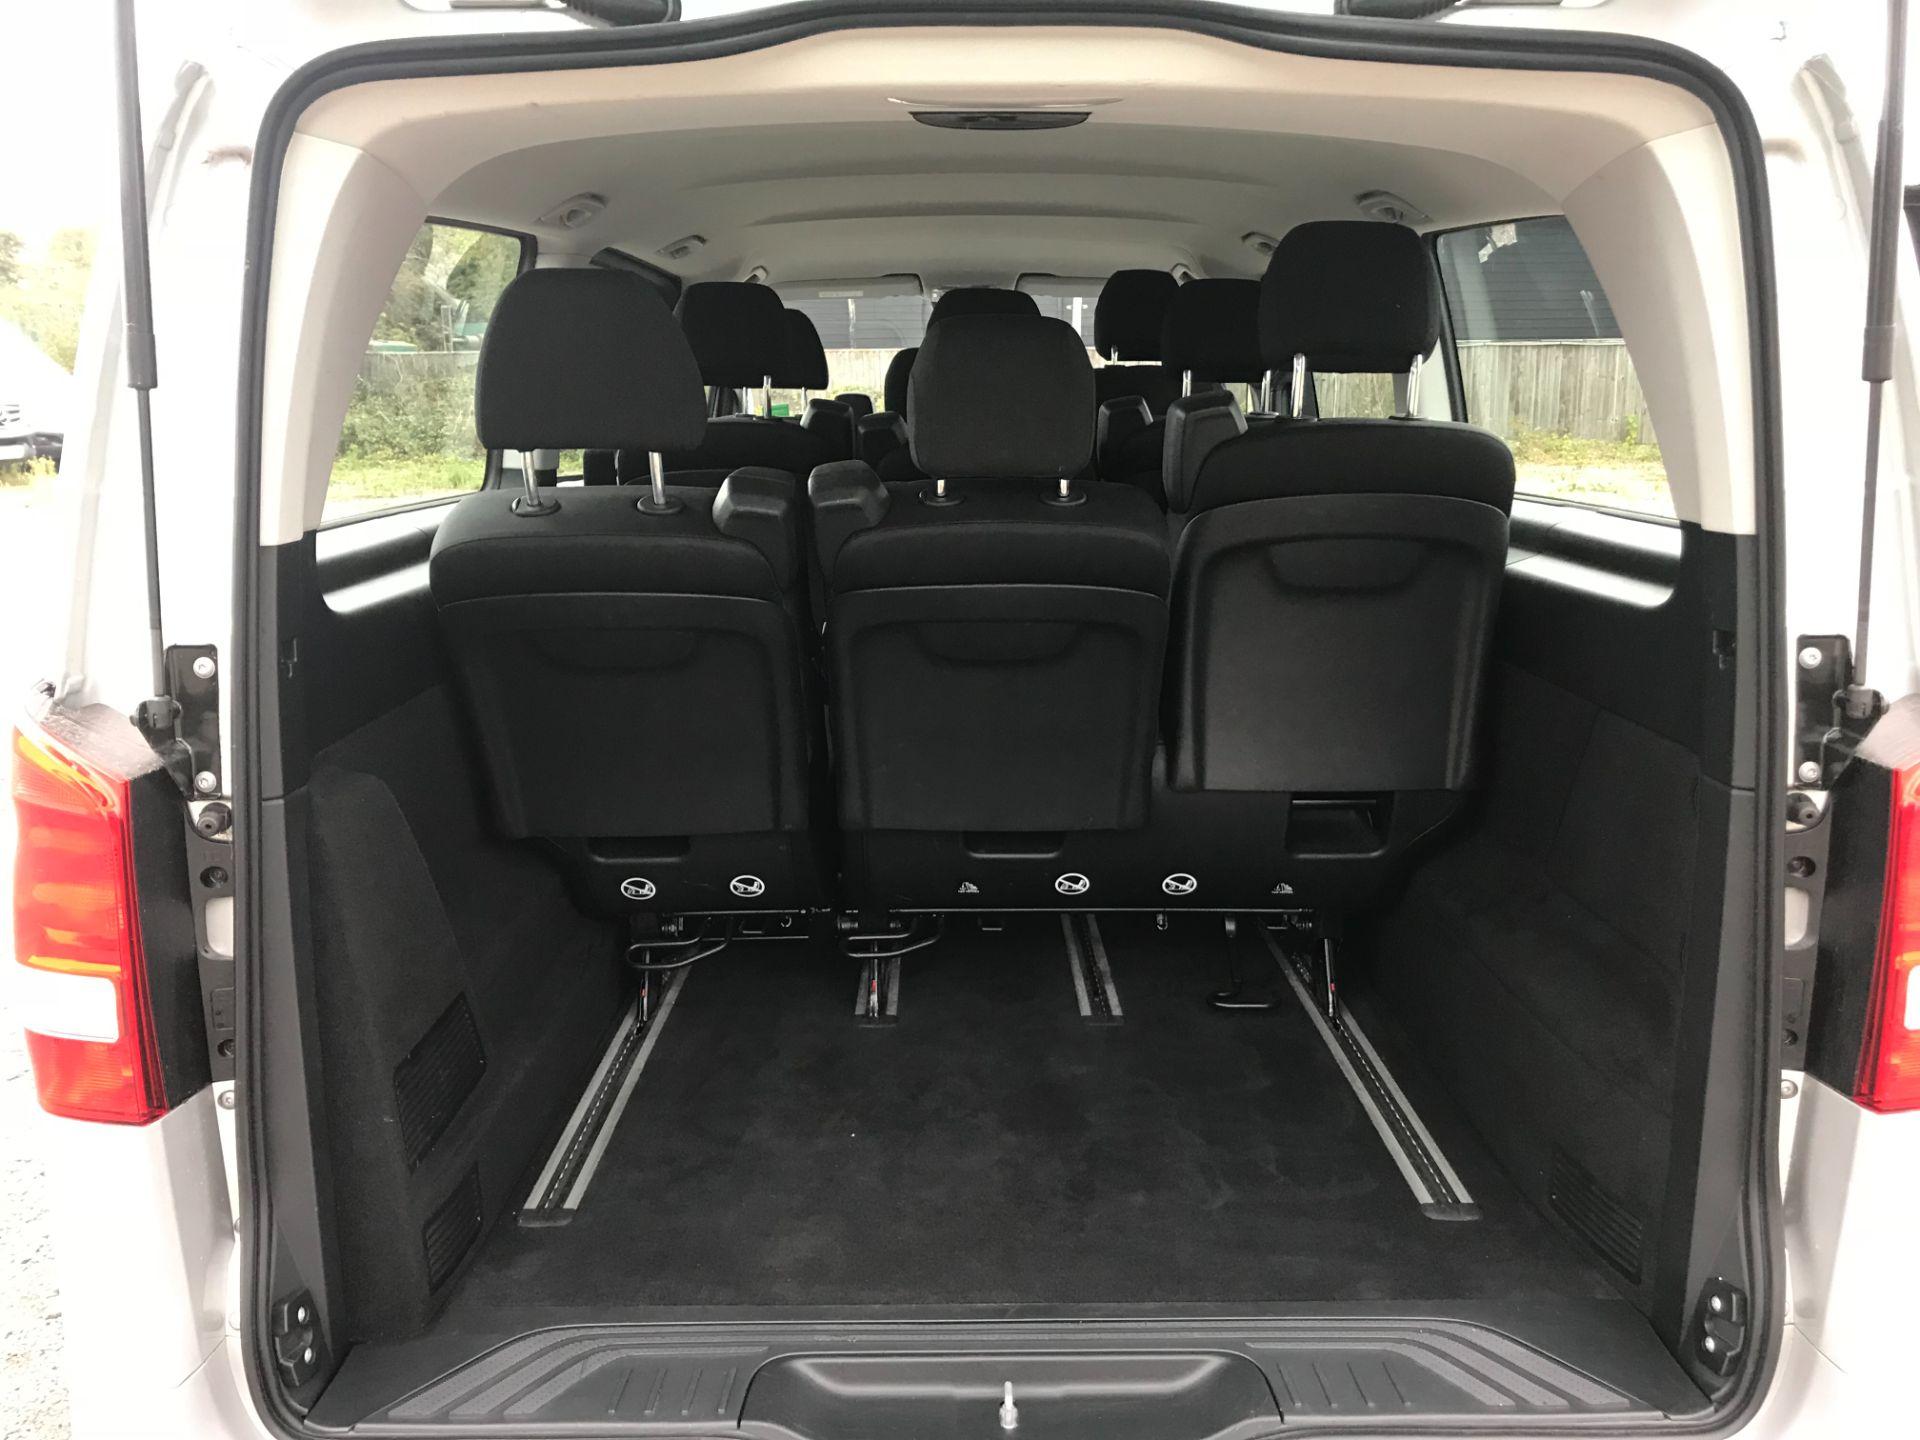 2019 Mercedes-Benz Vito 119 Cdi Select 8-Seater 7G-Tronic (KR19XWU) Image 16